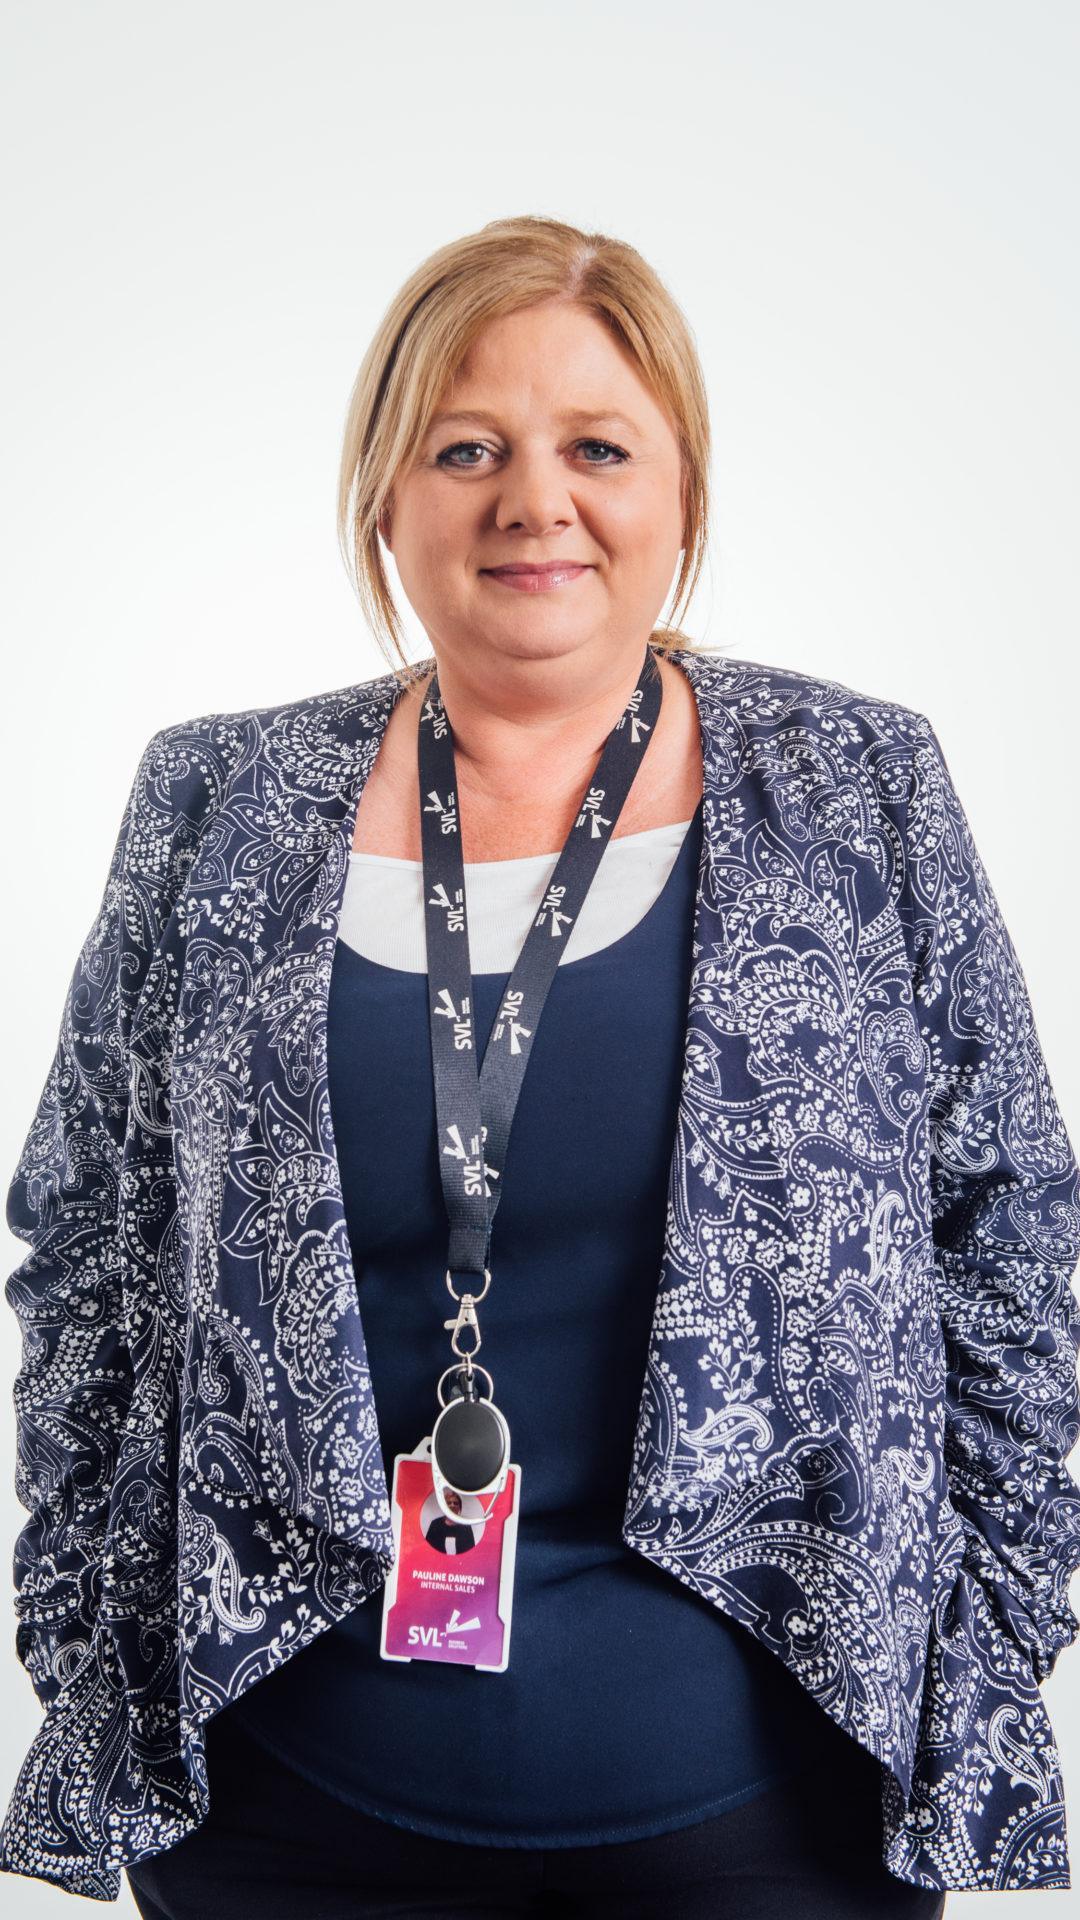 Pauline Dawson